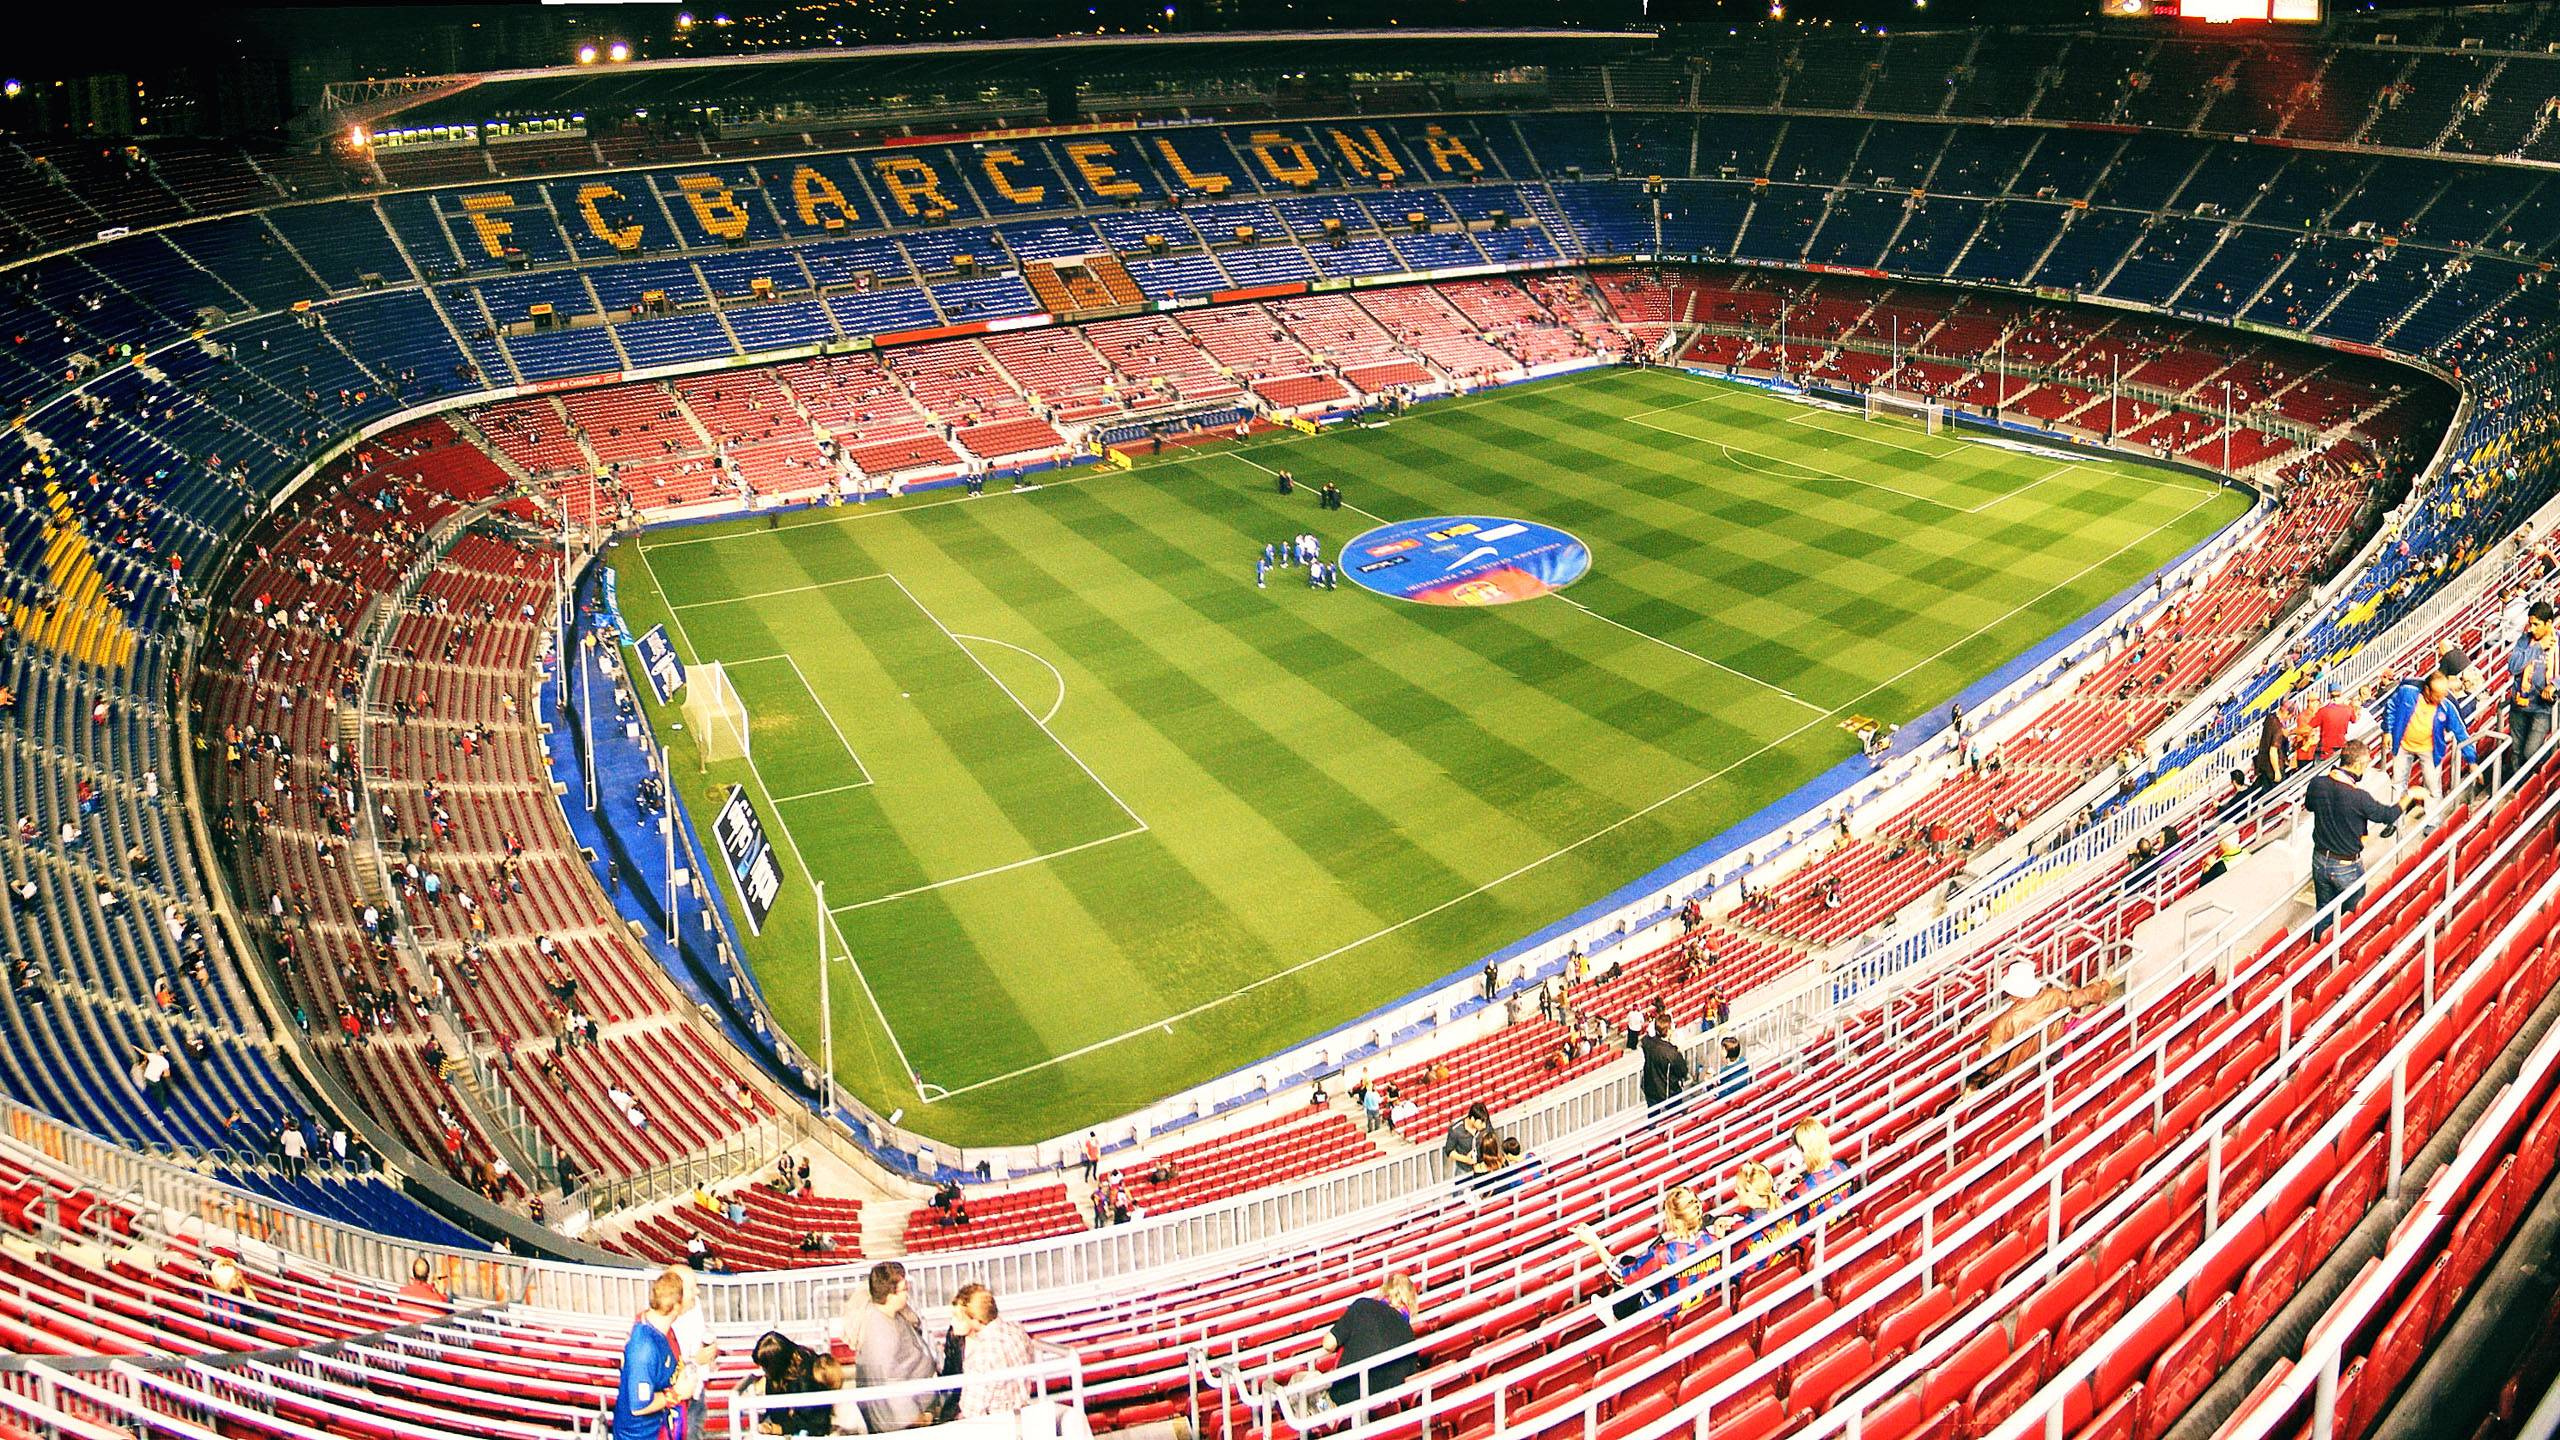 Camp Nou Wallpaper Download 2560x1440